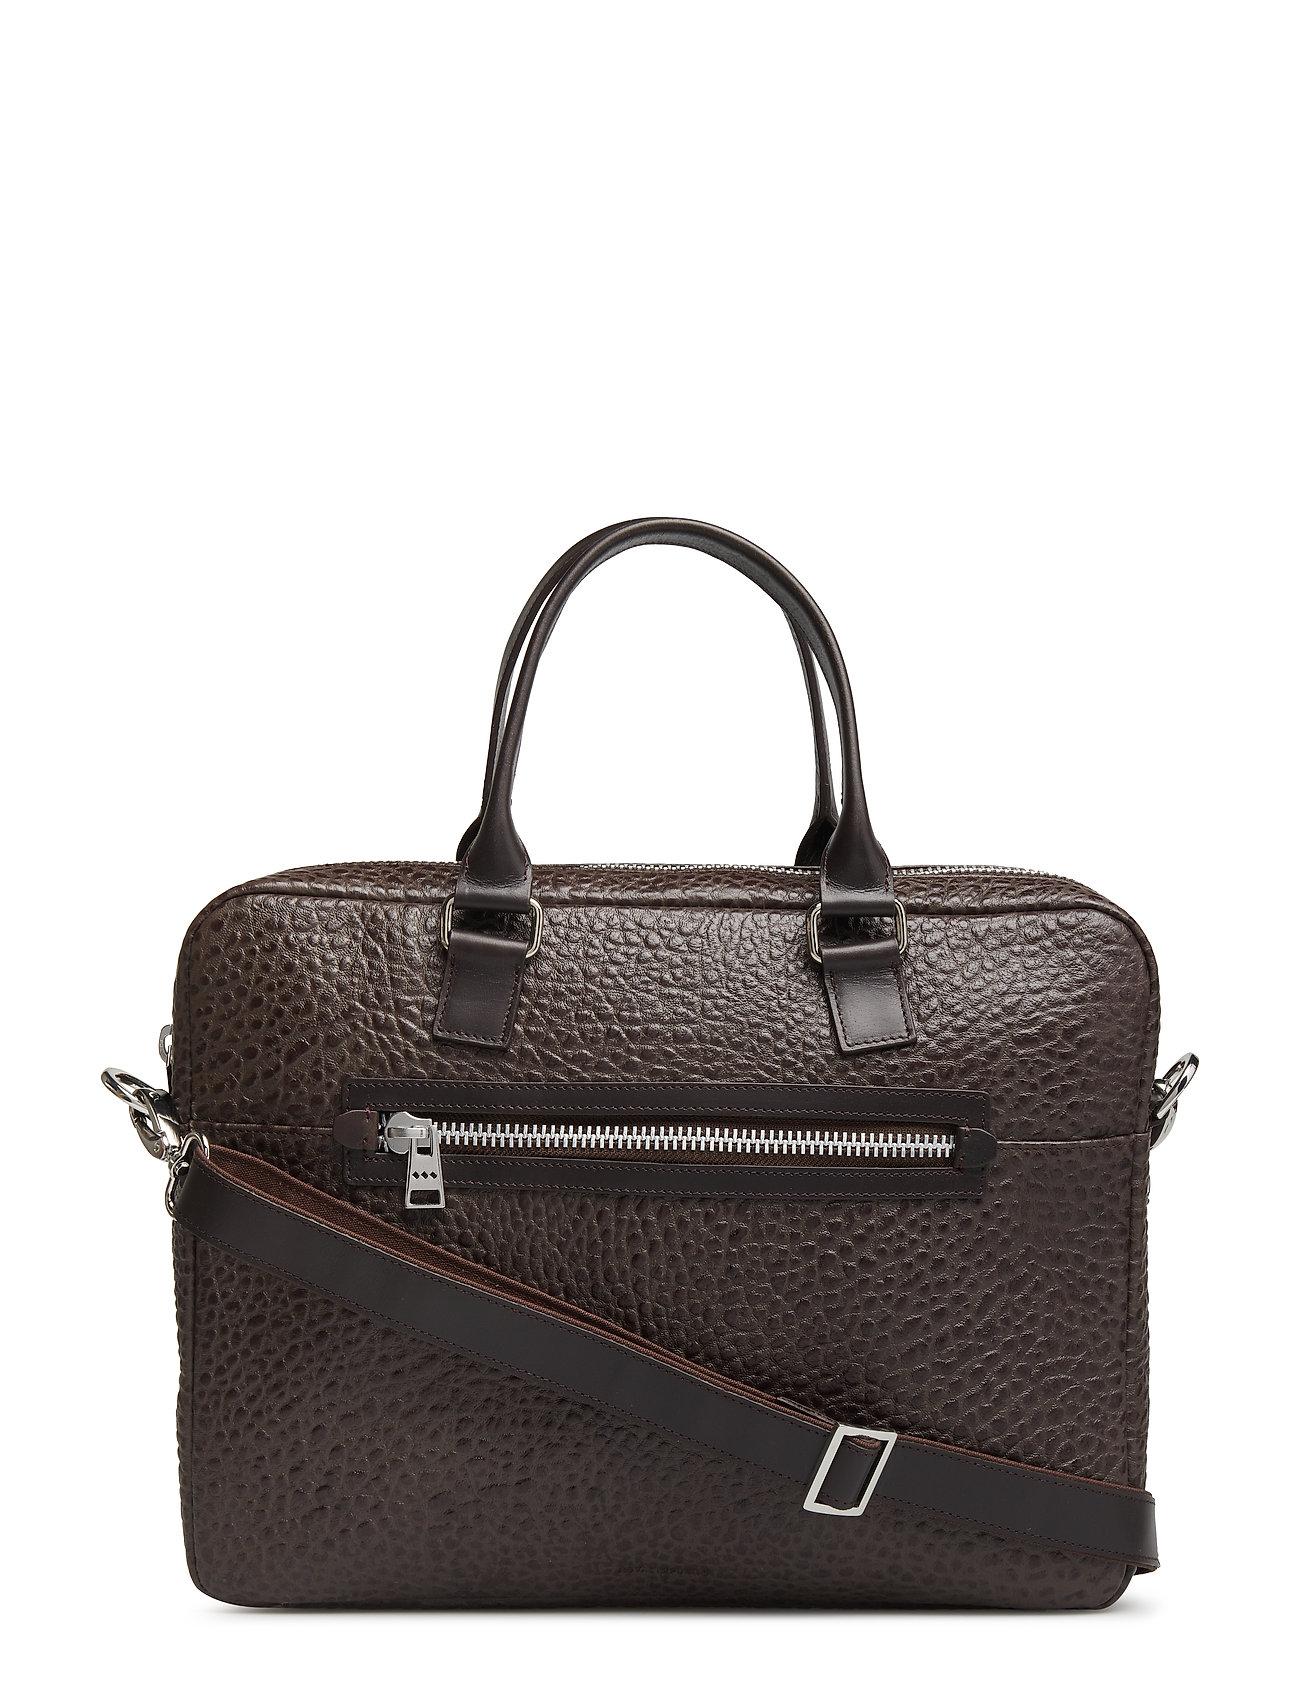 Royal RepubliQ Tenacity Day Bag - BROWN